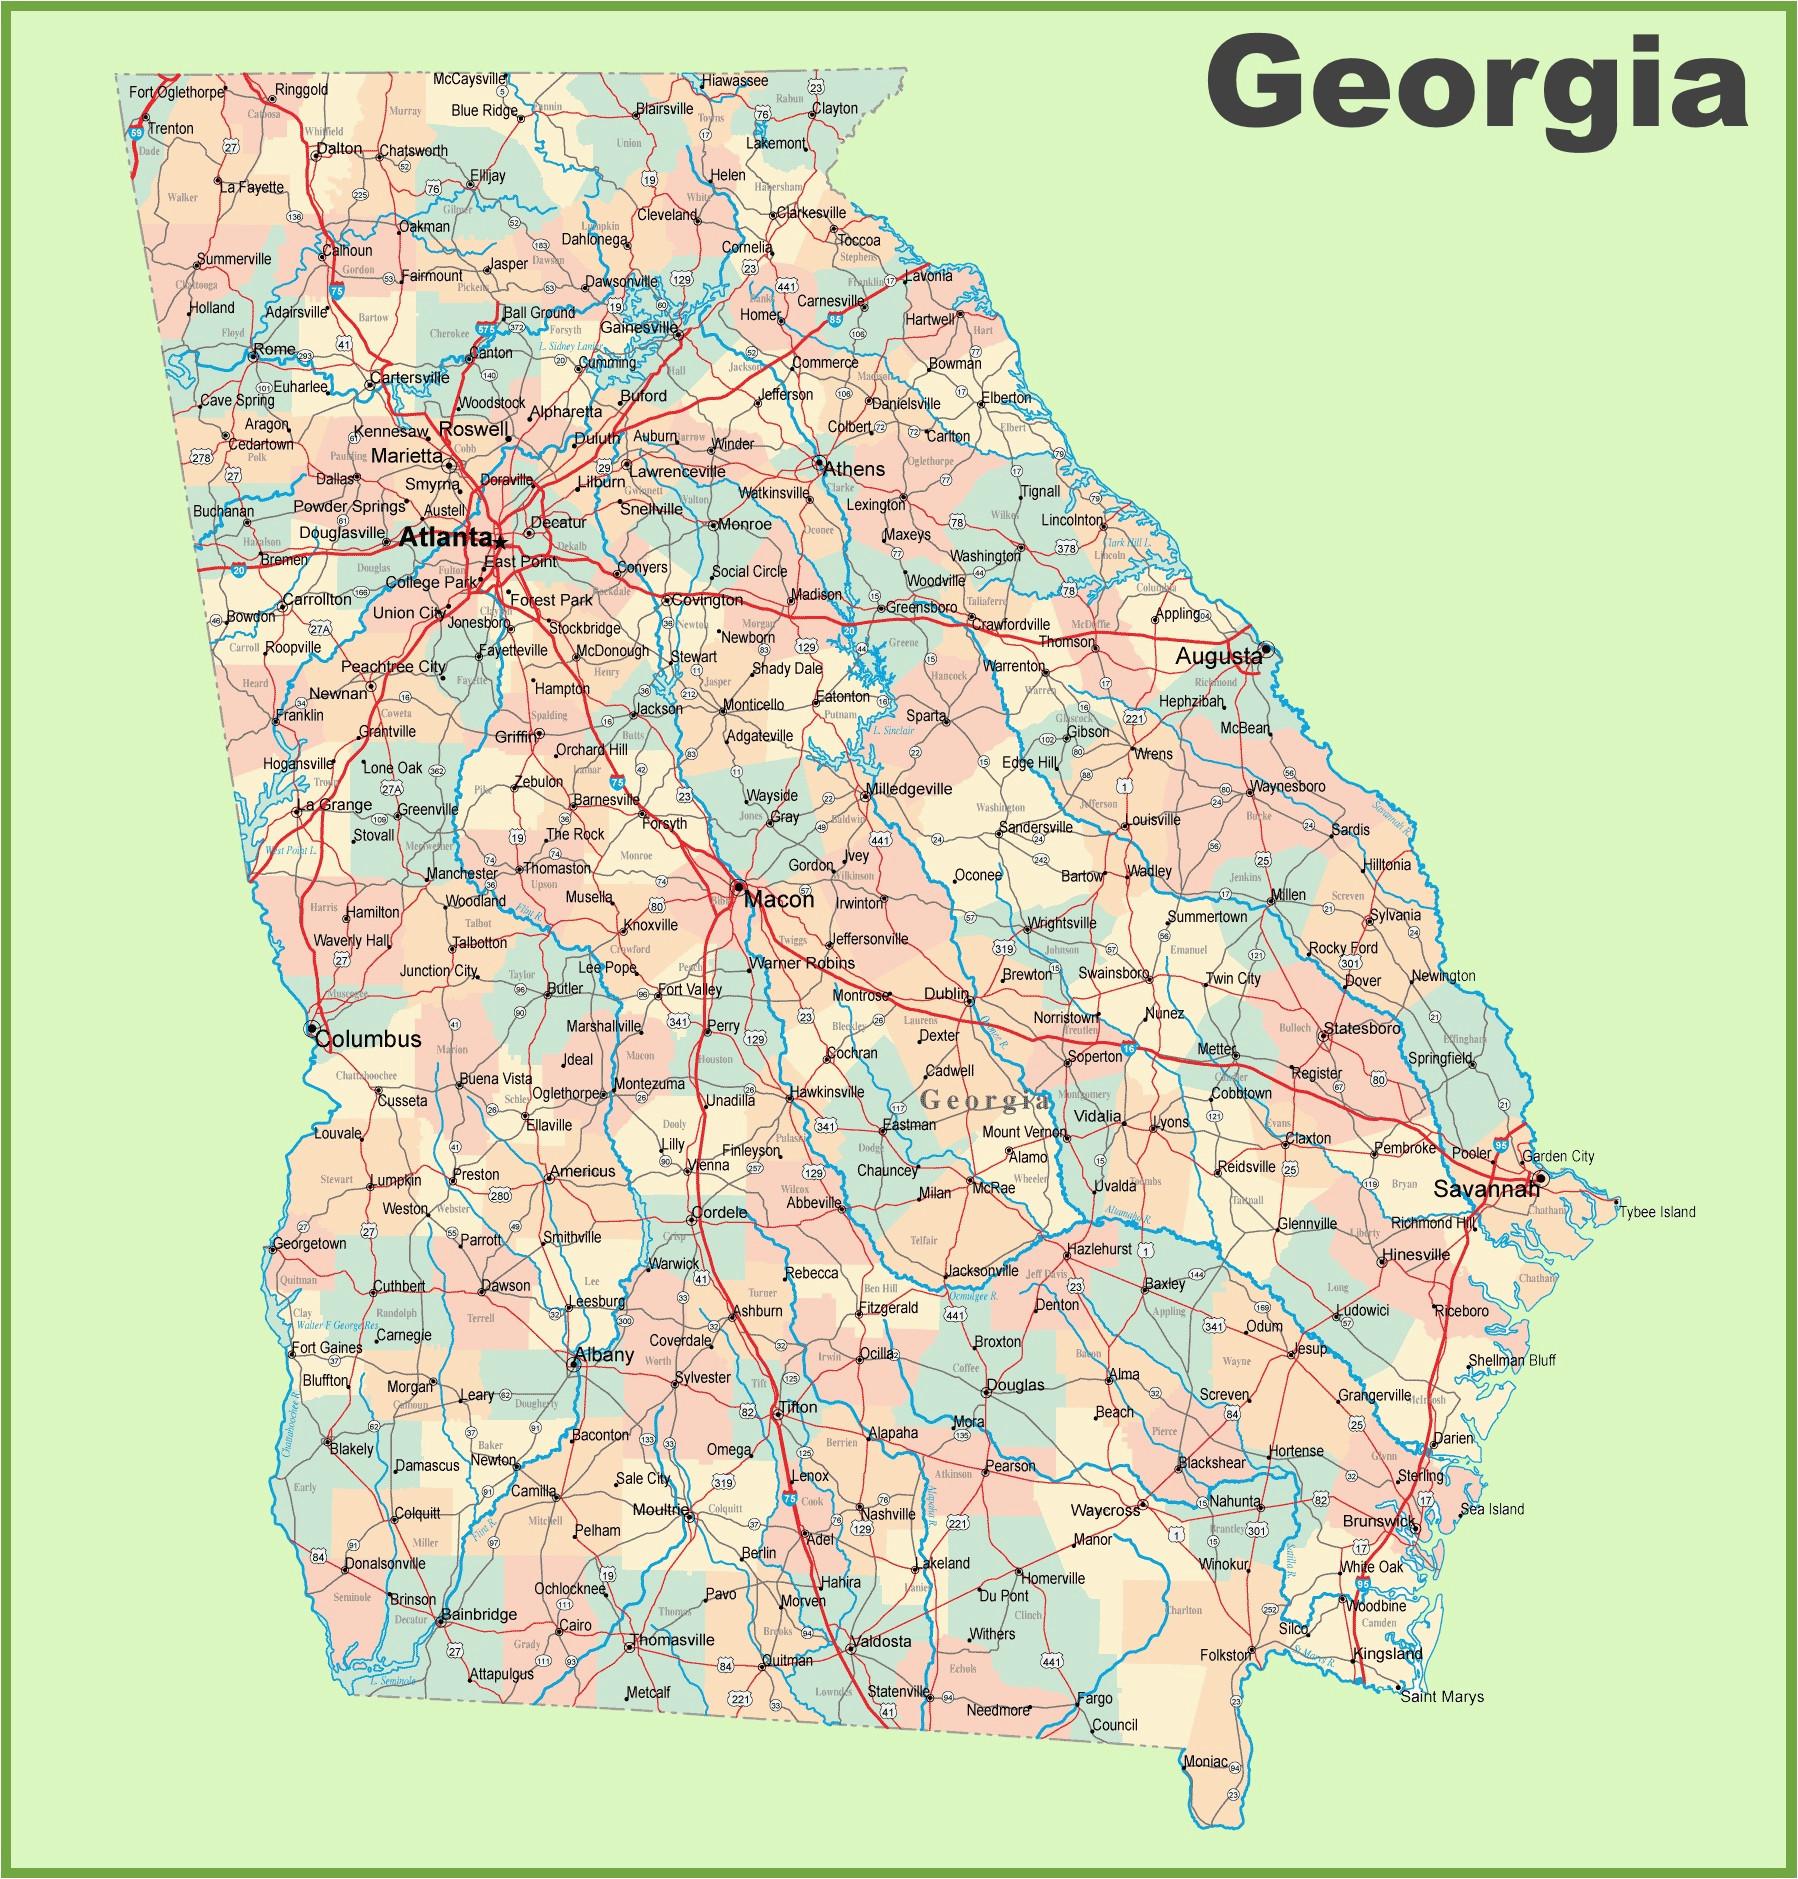 Map Of Georgia Alabama.Road Map Of Georgia And Alabama Georgia Road Map With Cities And